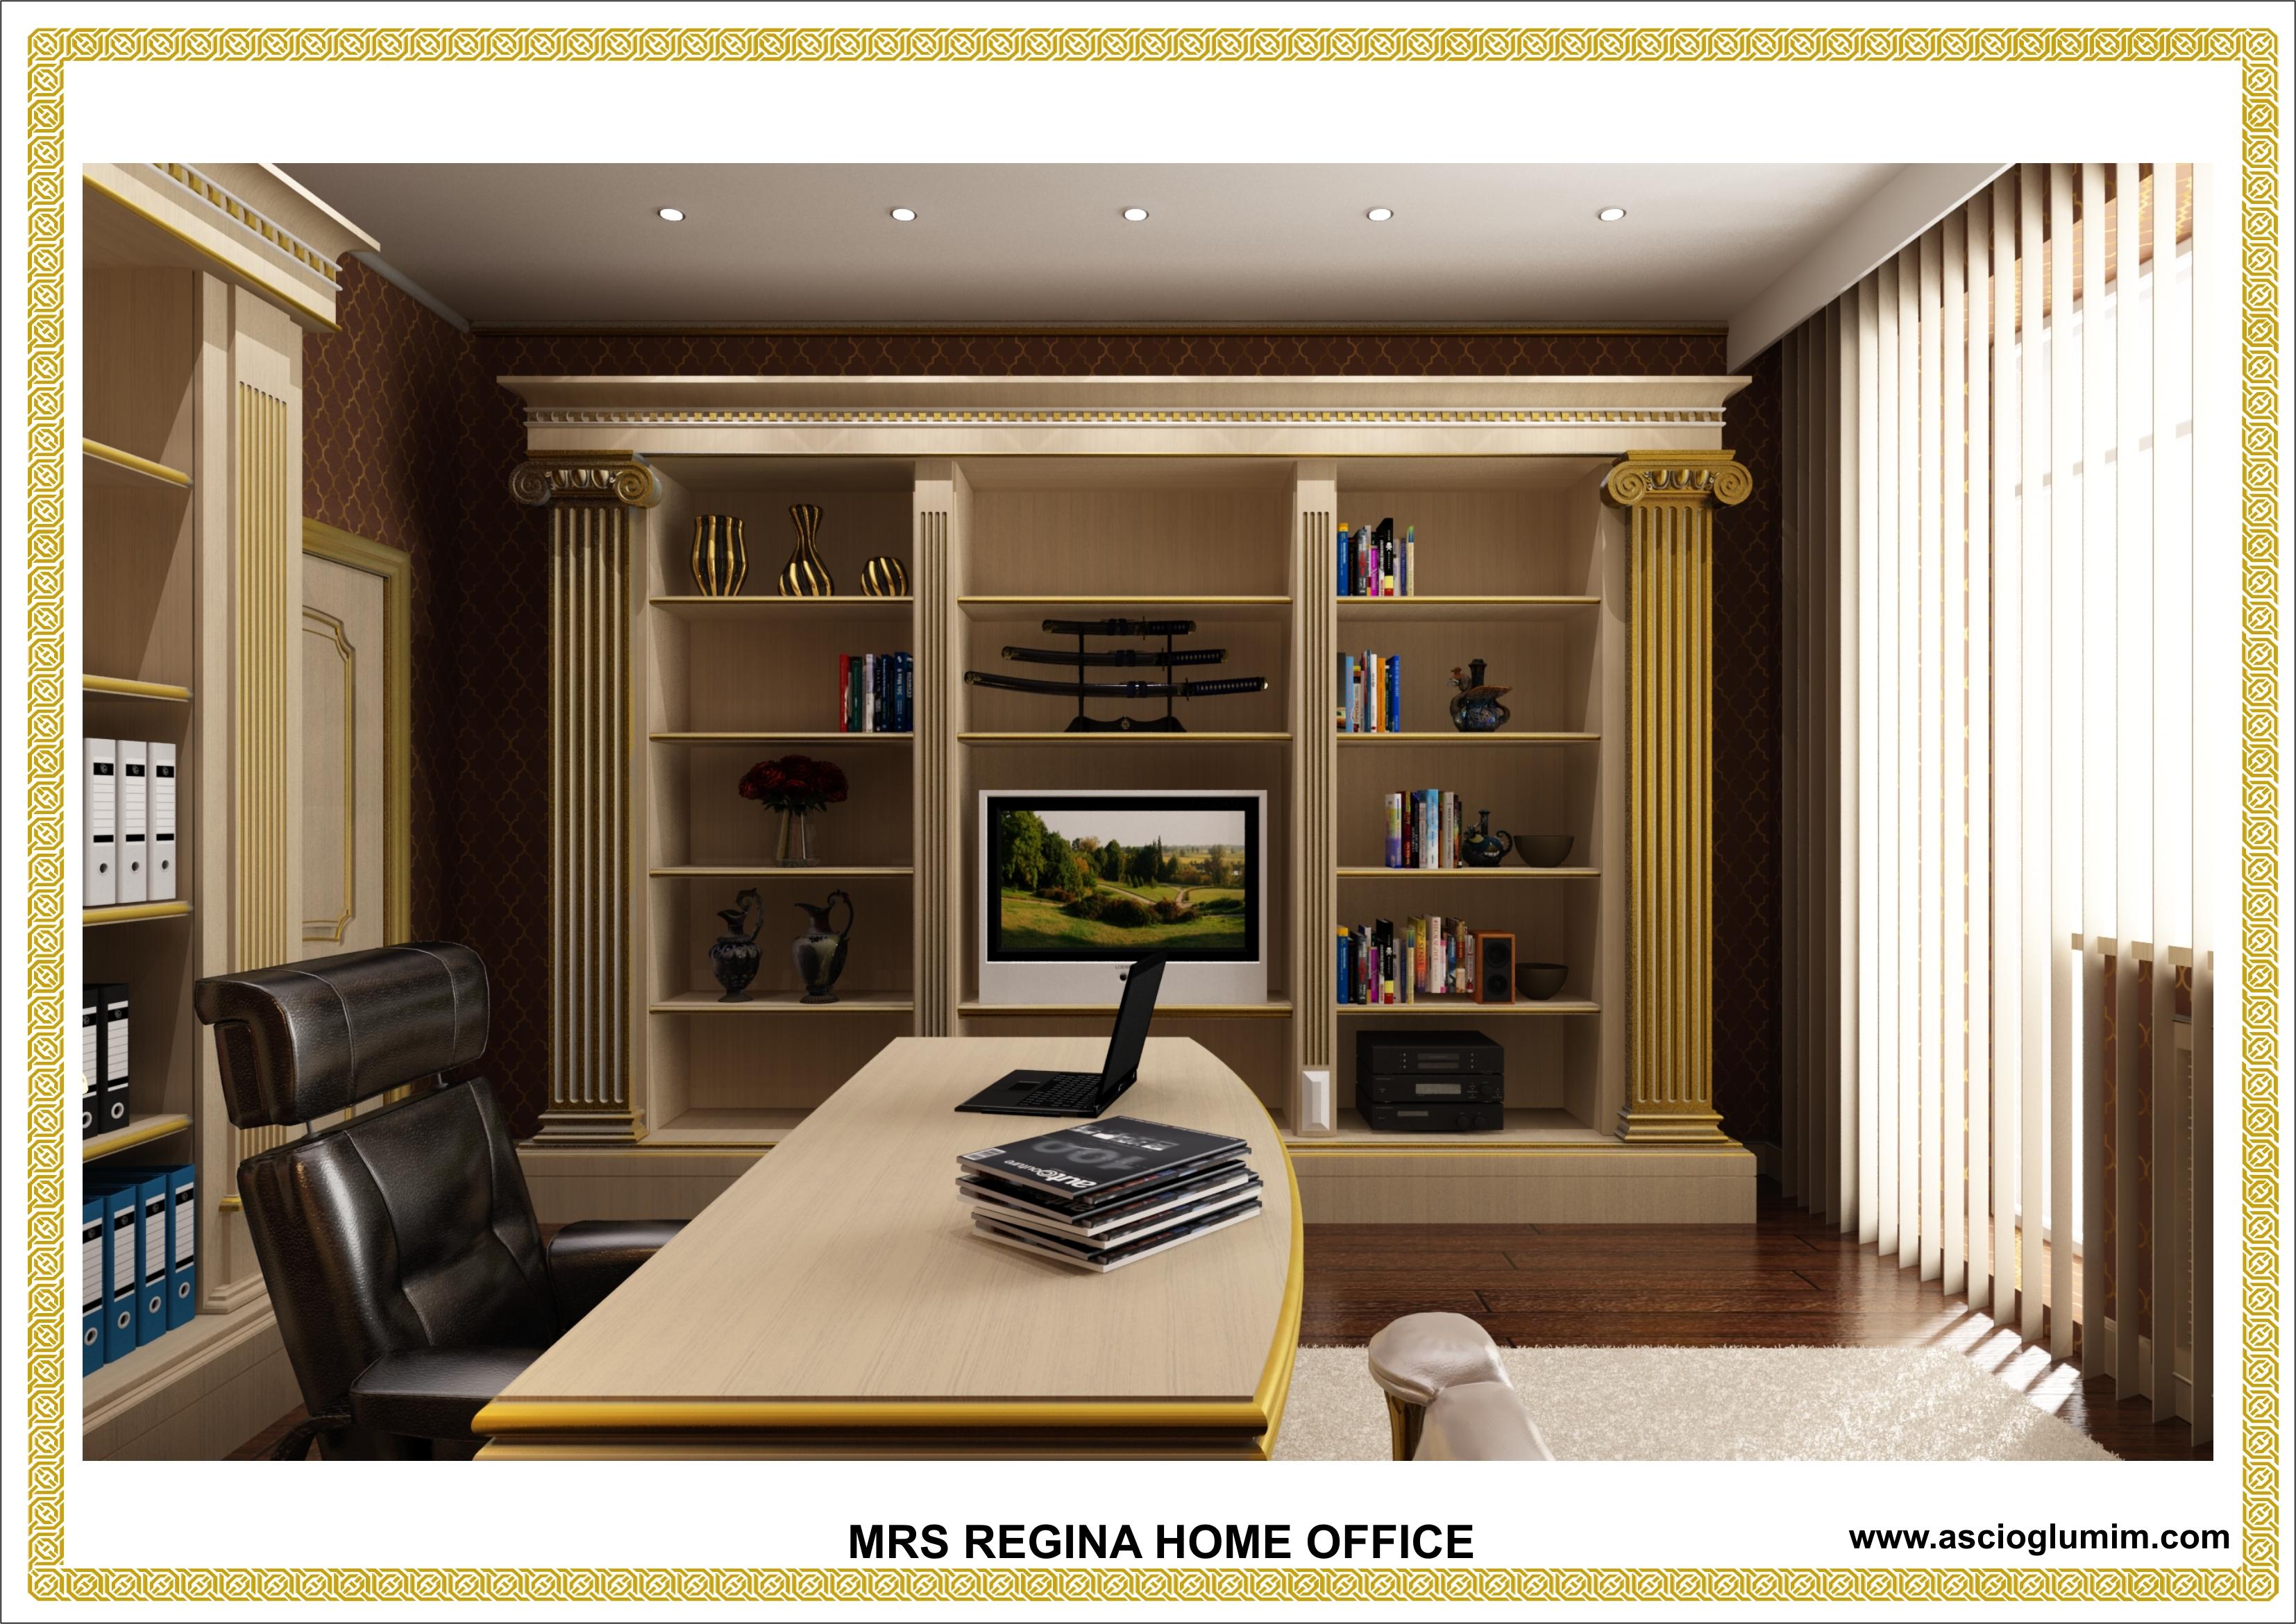 MRS.REGINA VILLAGE DESIGN